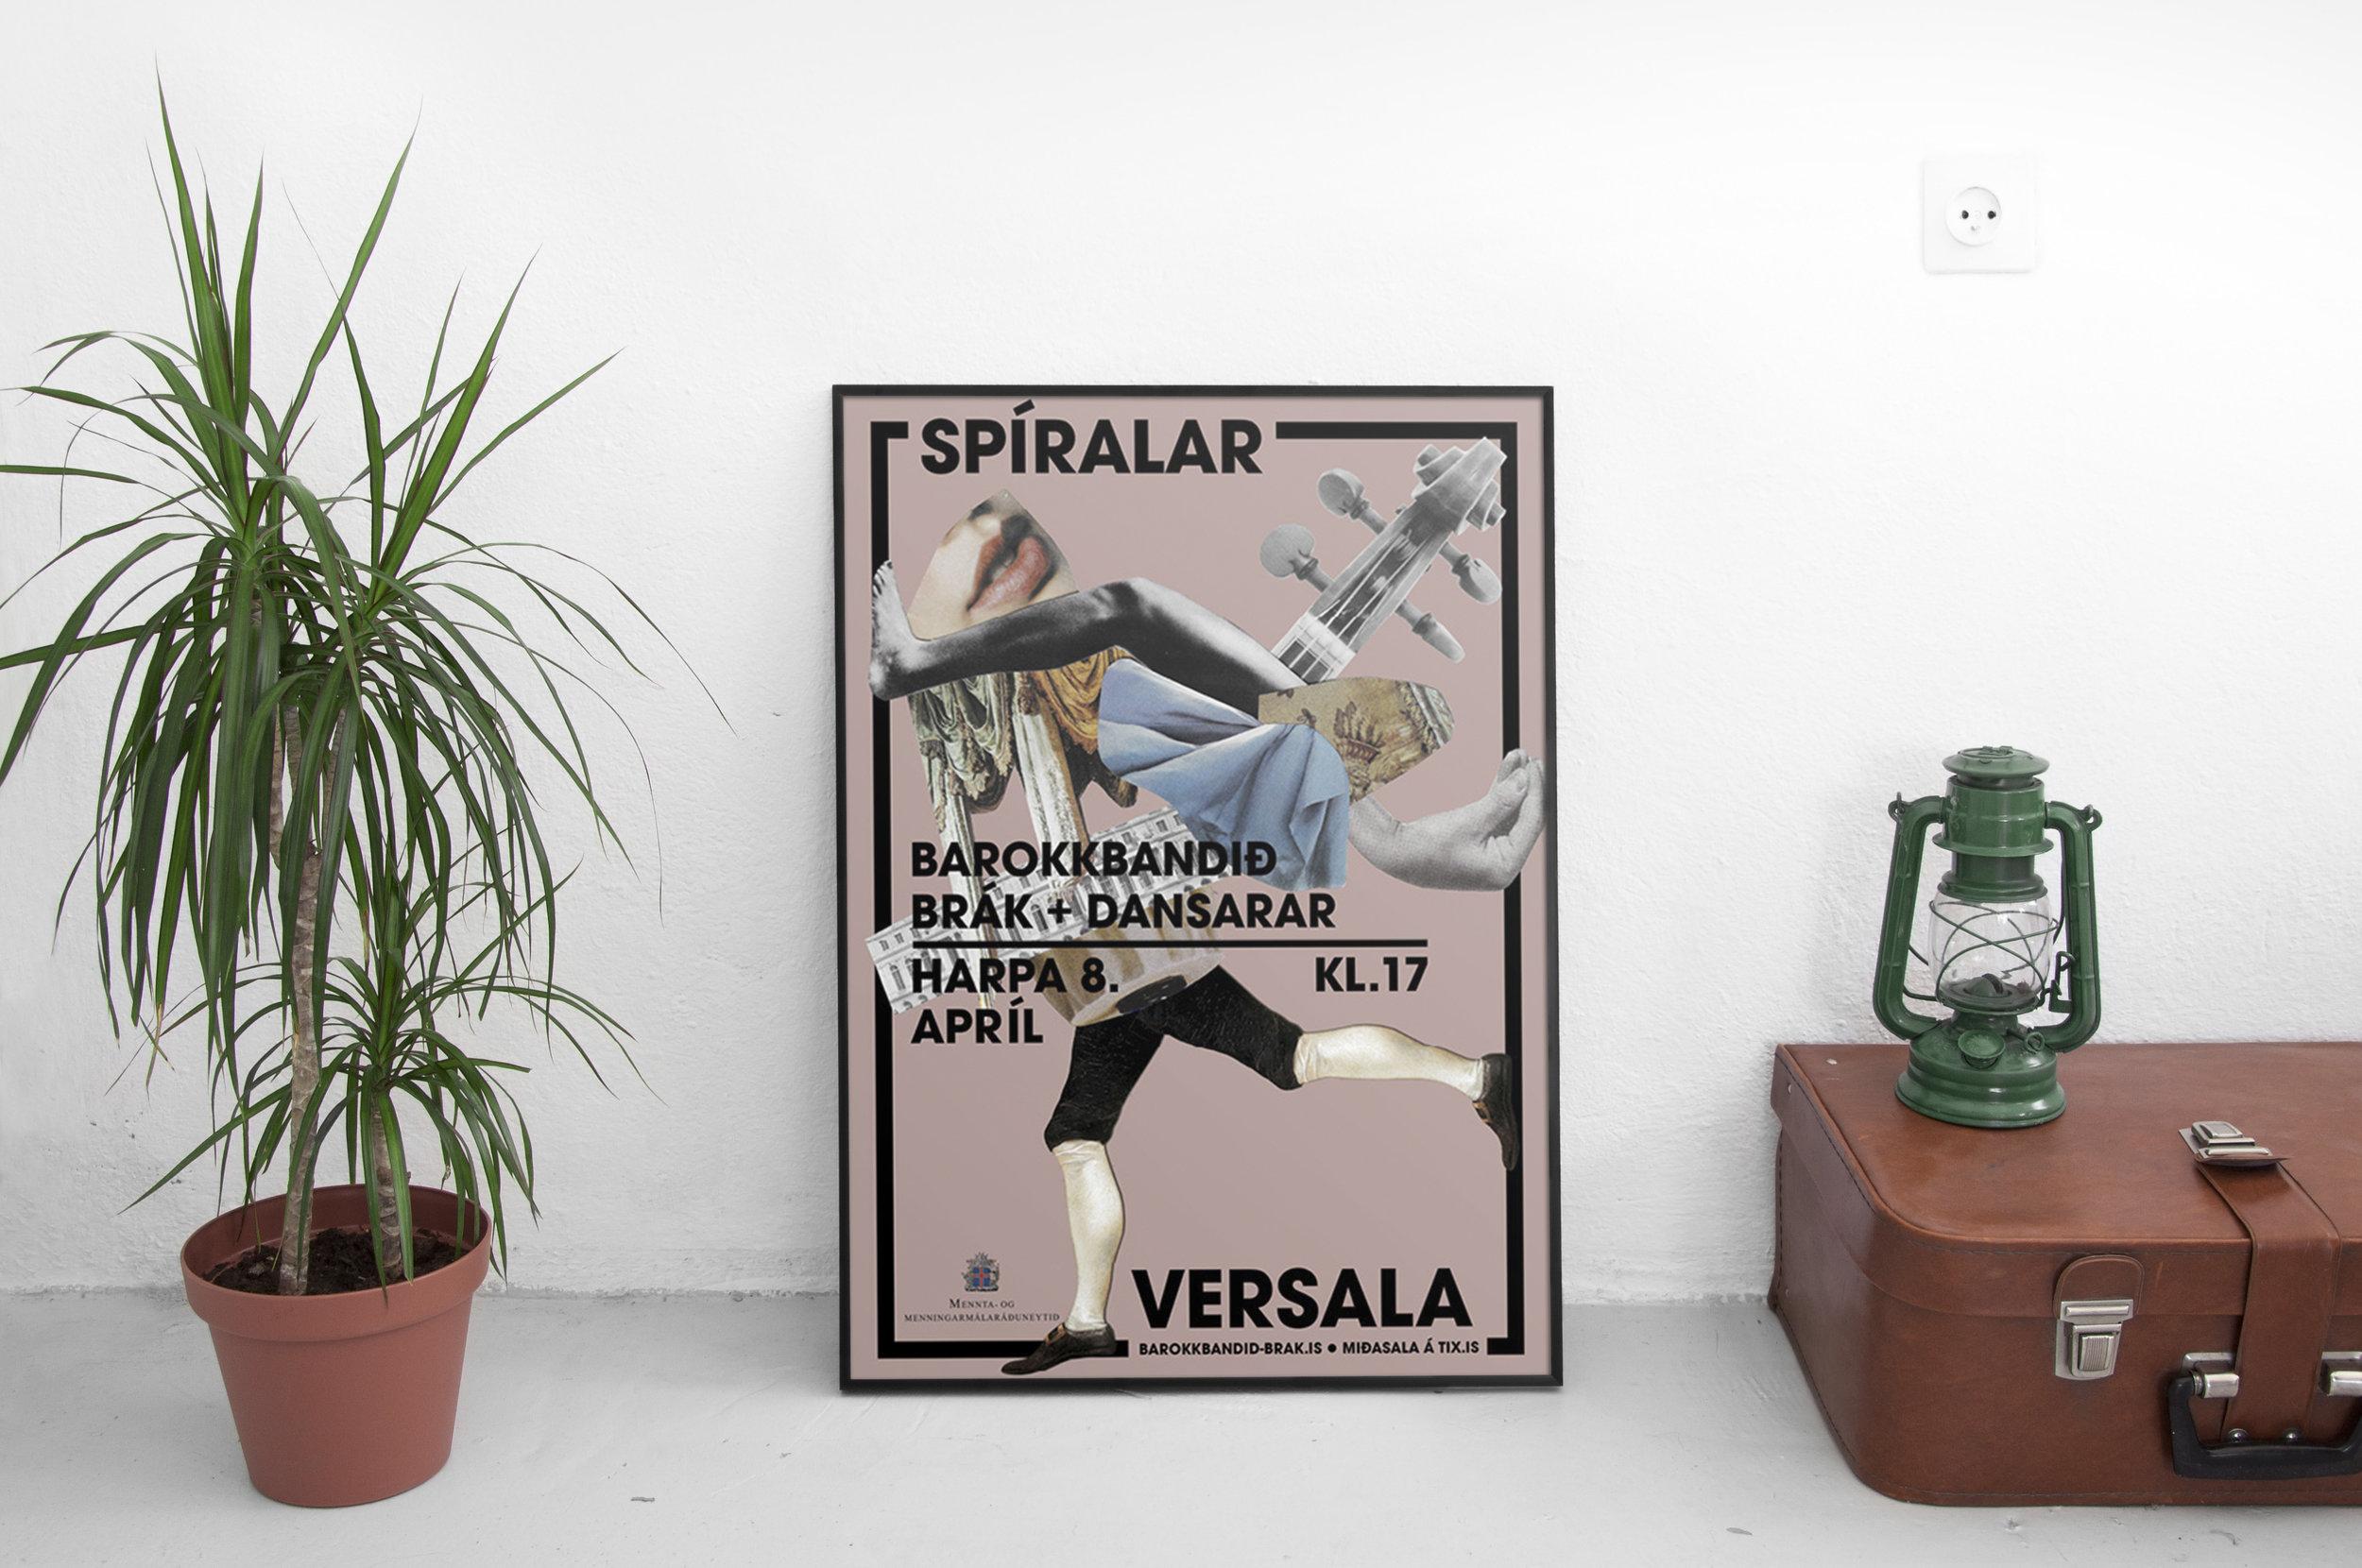 spiralar+versala+Concert+branding+poster+|+tomasdottir.+|+logo+design,+marketing+design,+clipart,+baroque+branding